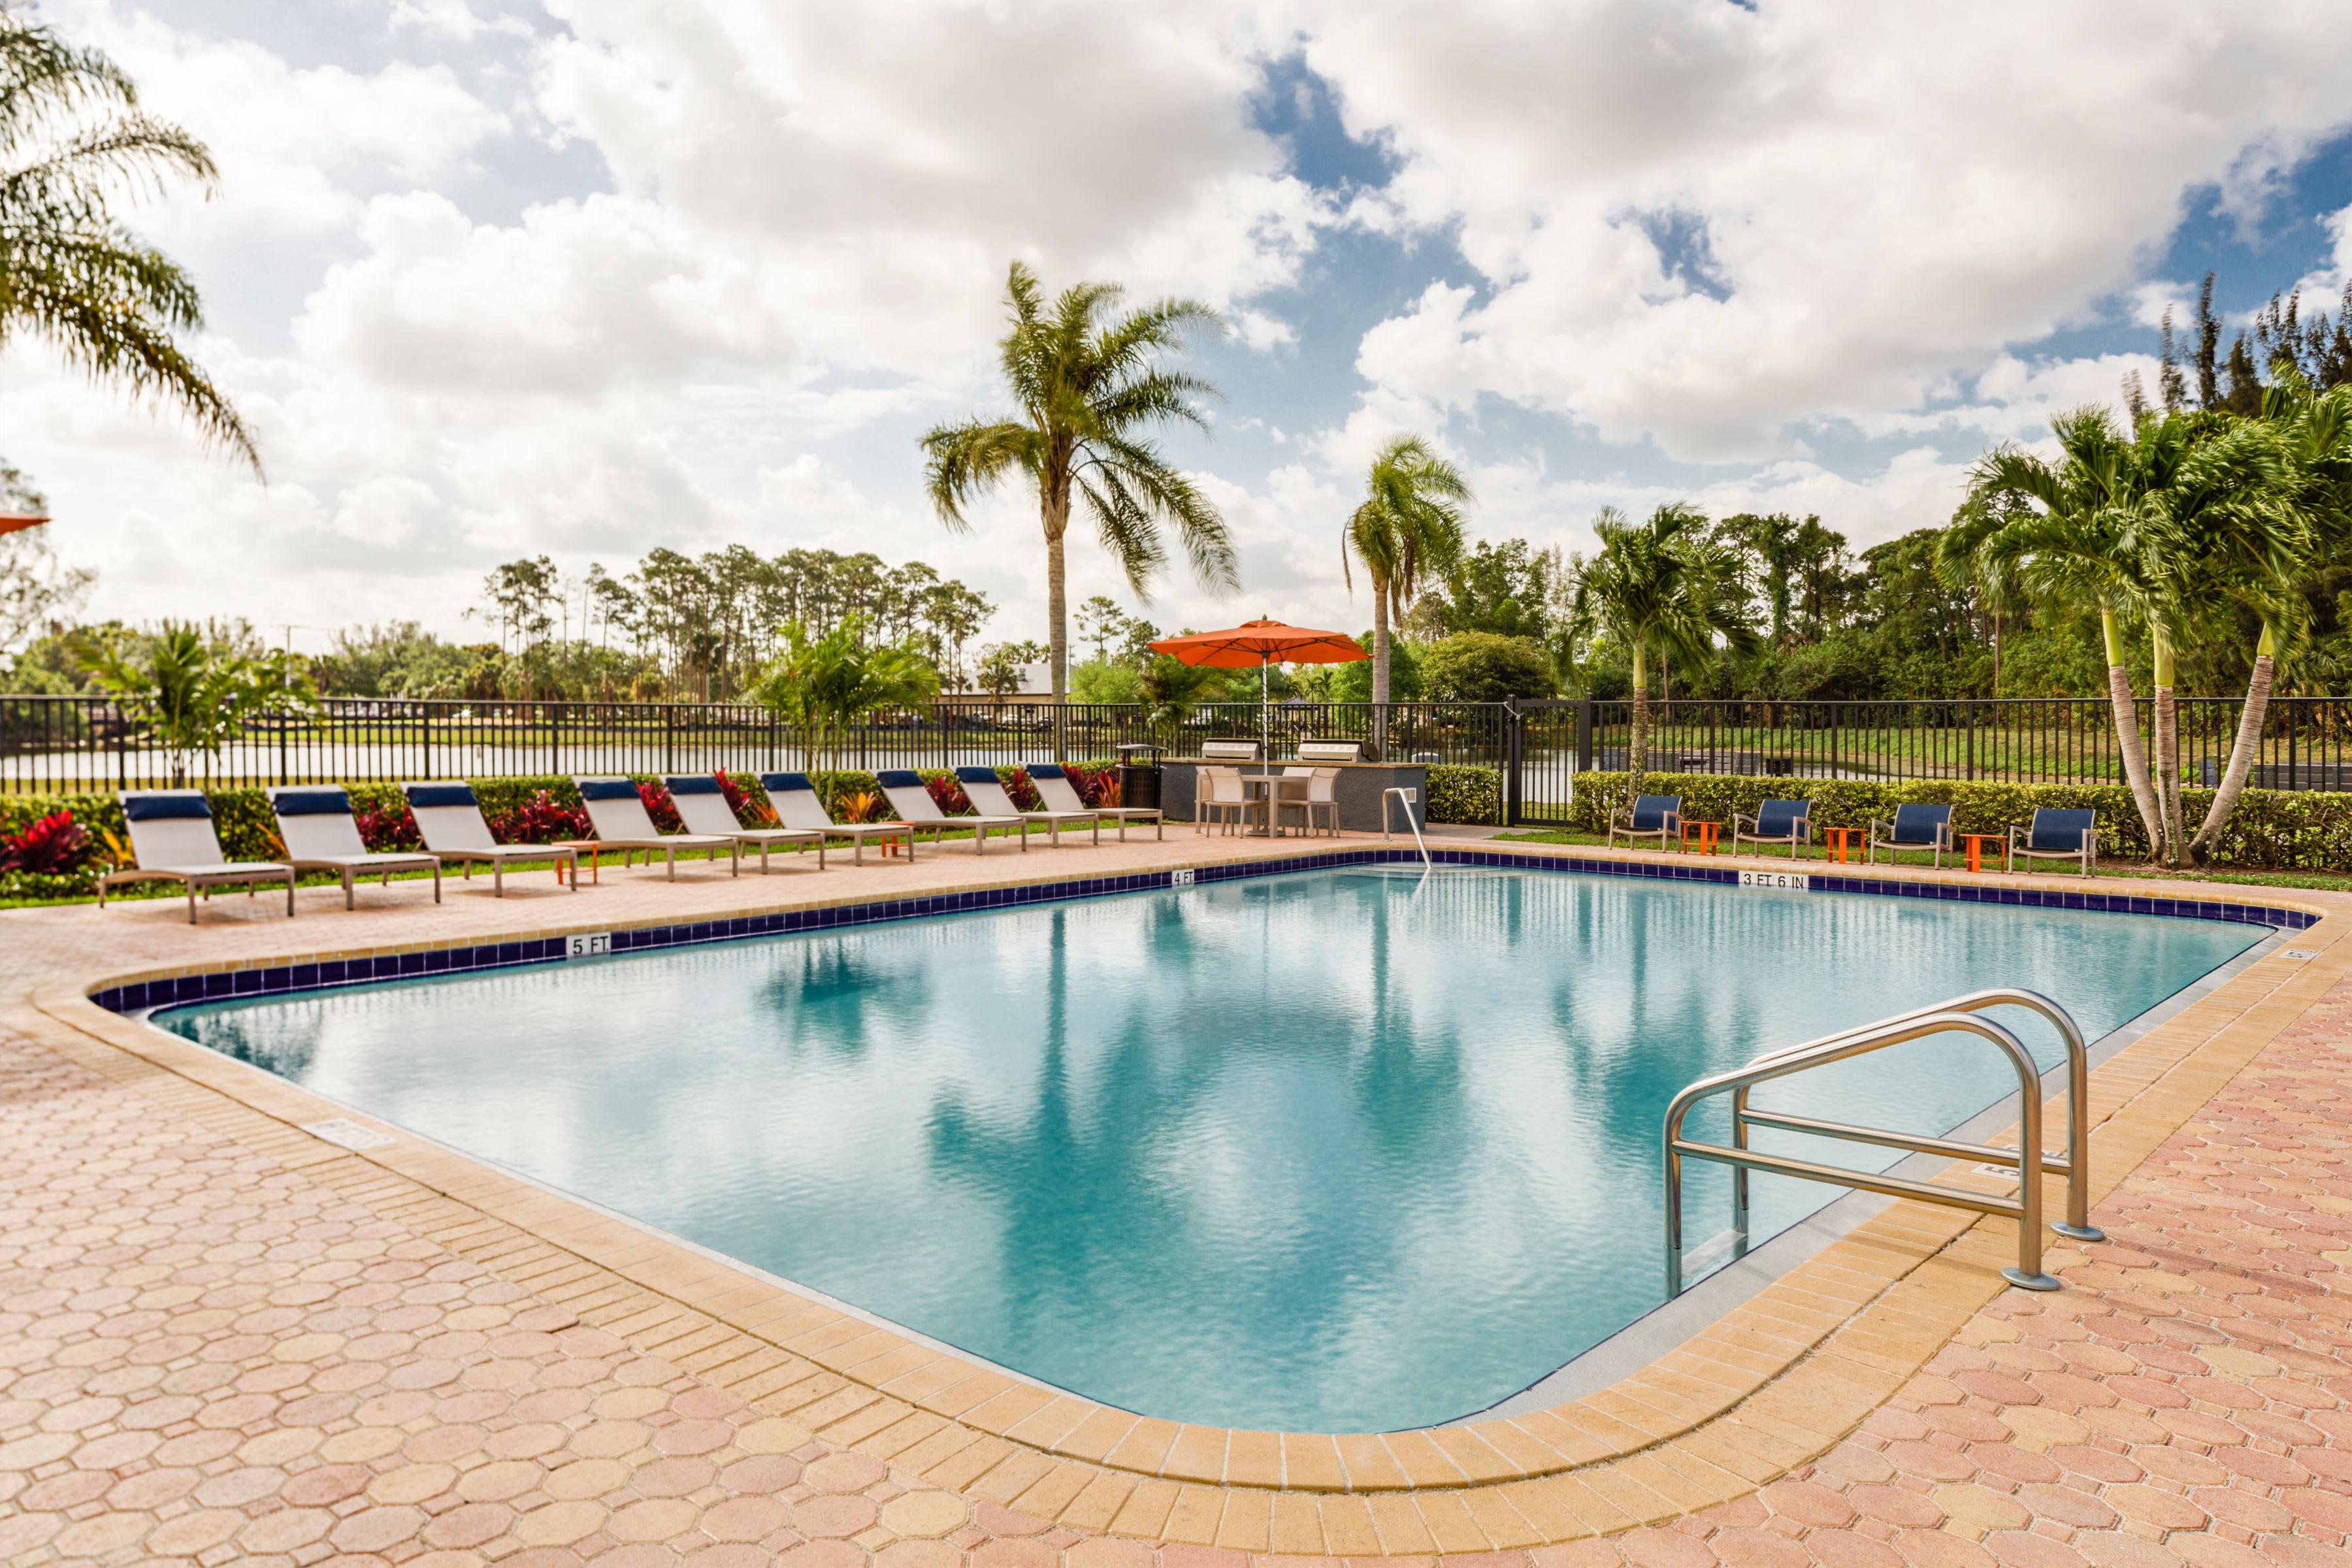 Picnic area with views of the lake at Verse at Royal Palm Beach in Royal Palm Beach, Florida